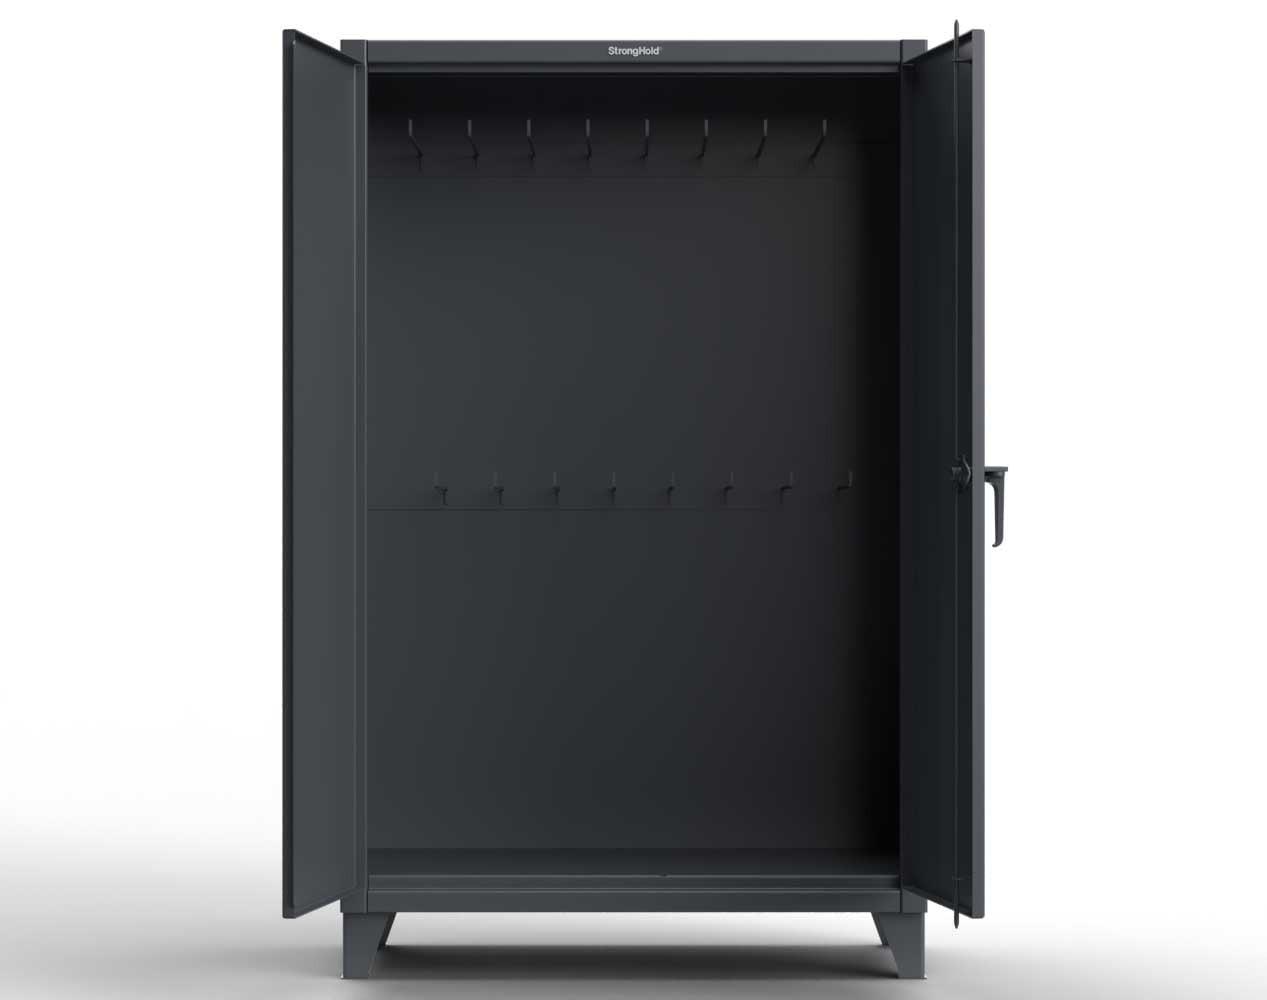 Extra Heavy Duty 12 GA Cabinet with 24 Hooks – 72 In. W x 24 In. D x 78 In. H